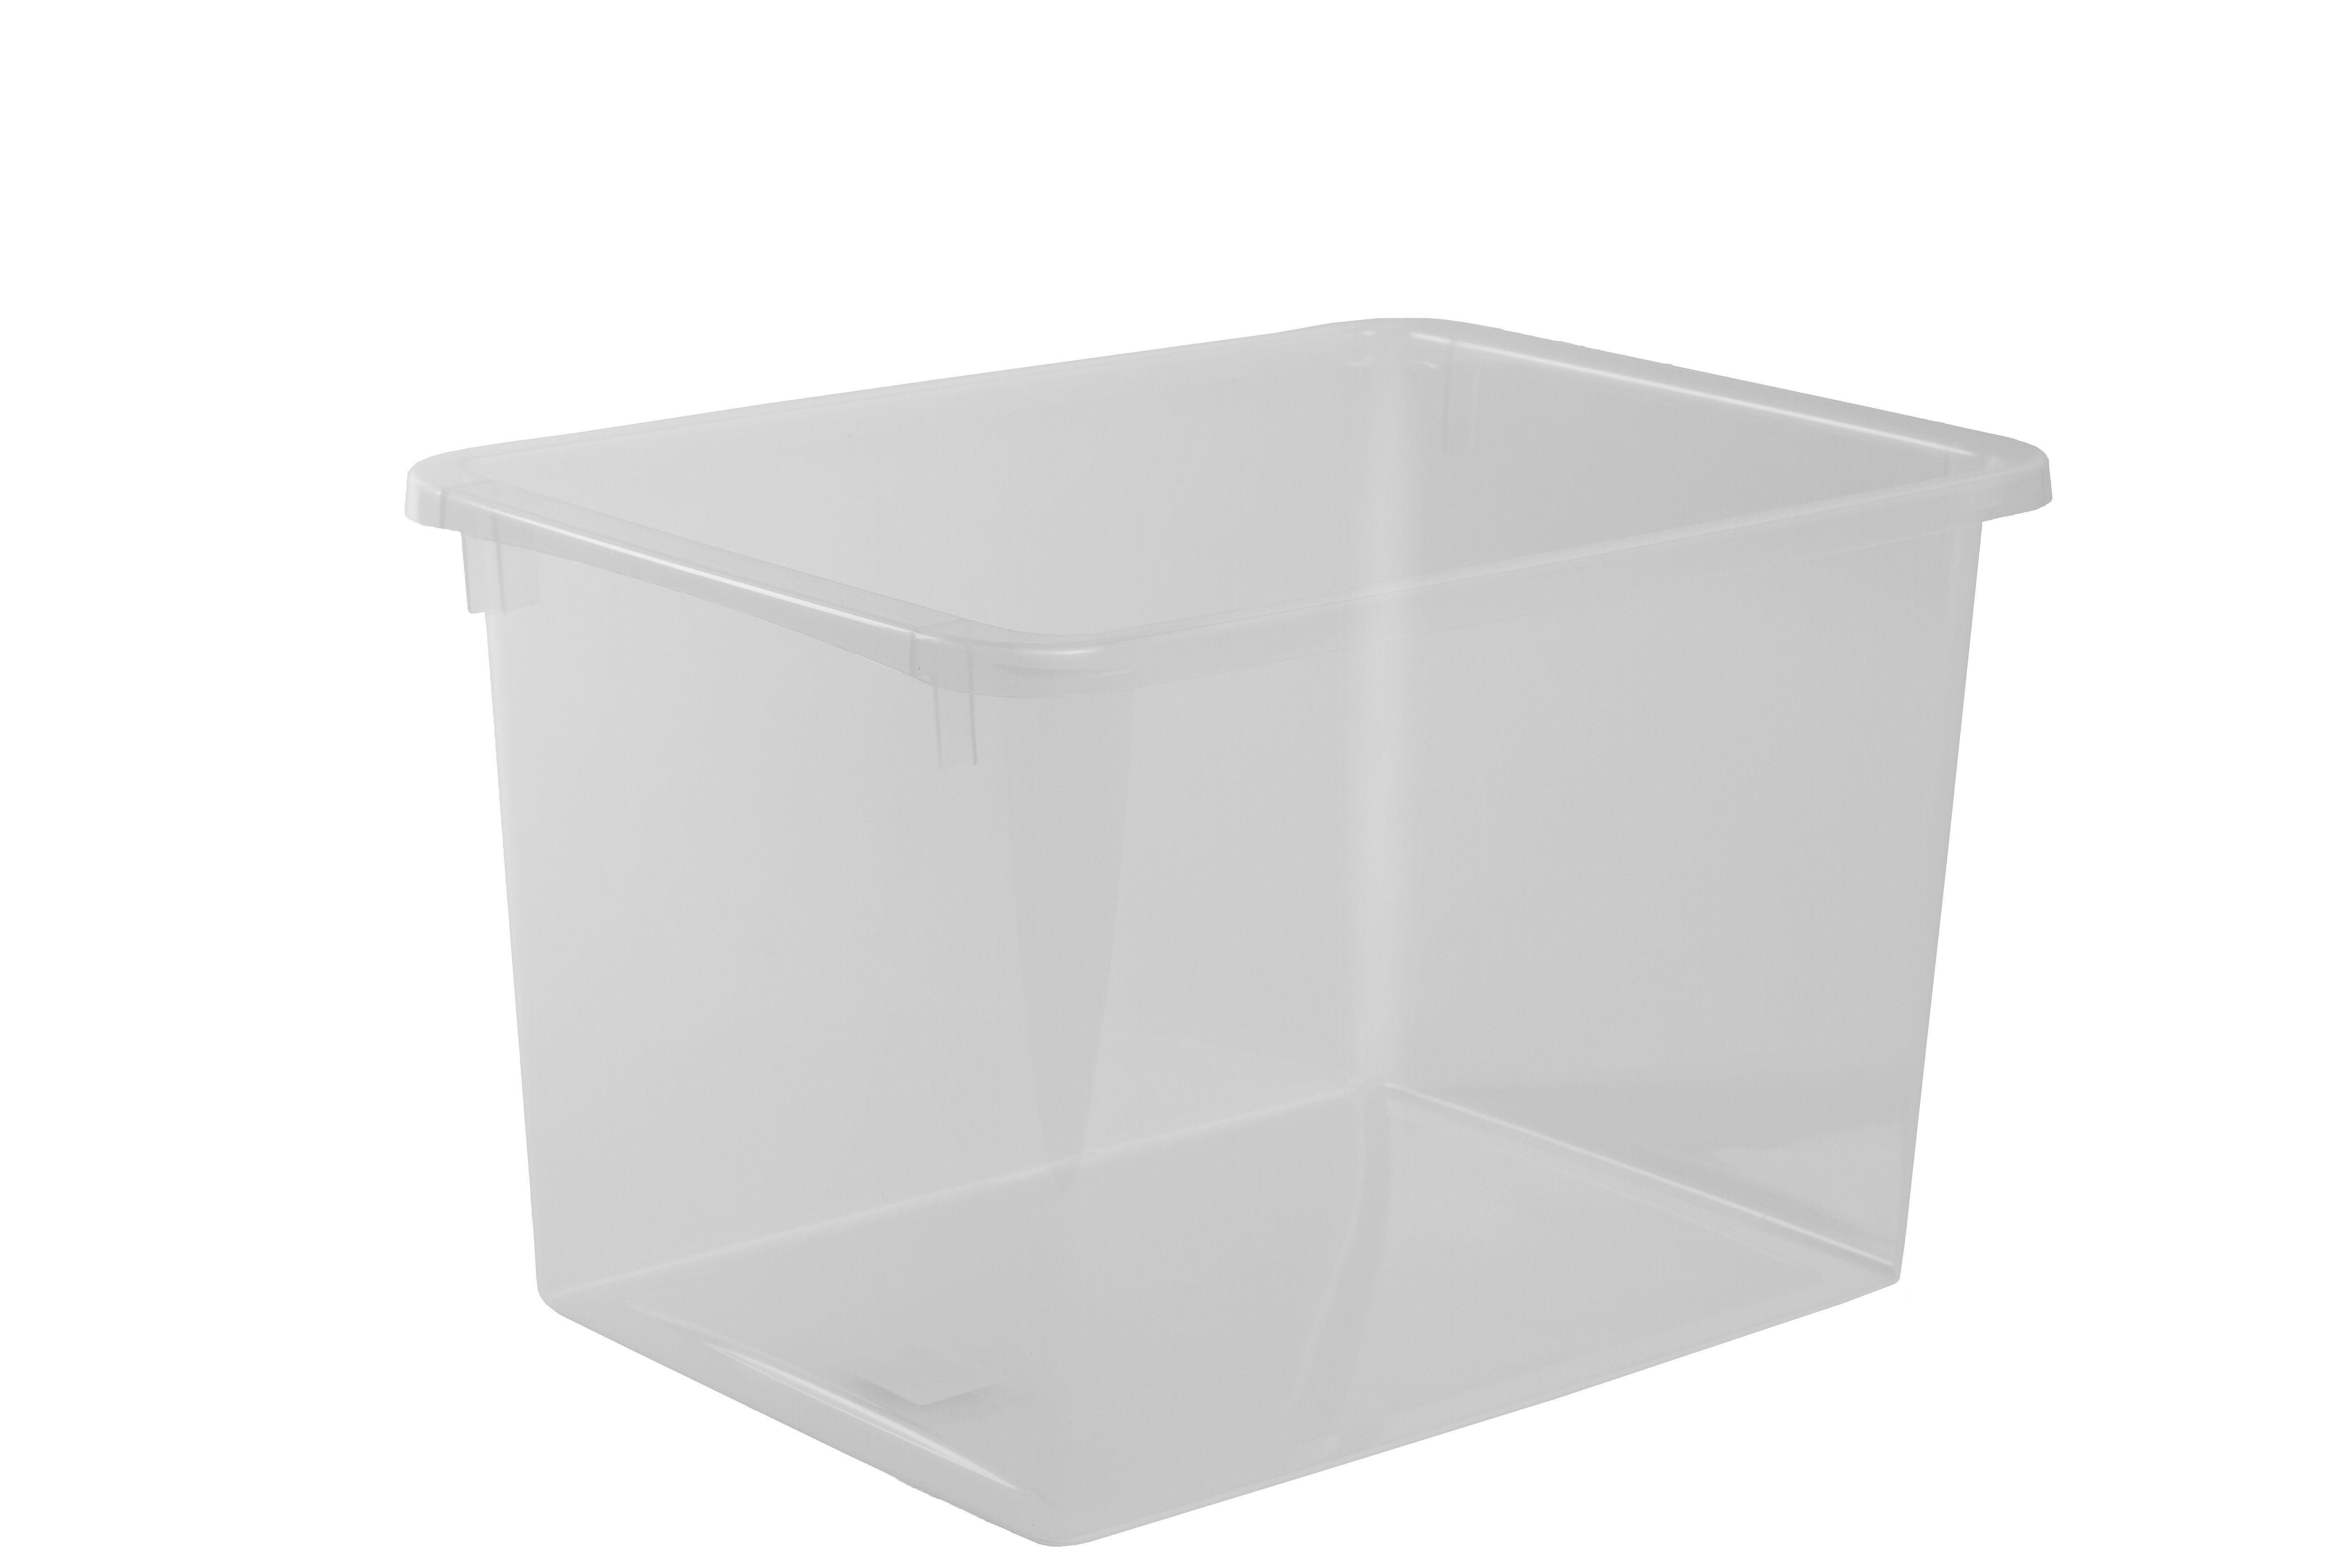 Store 7820-0500 Store IT Oppbevaringsboks transparent 20L